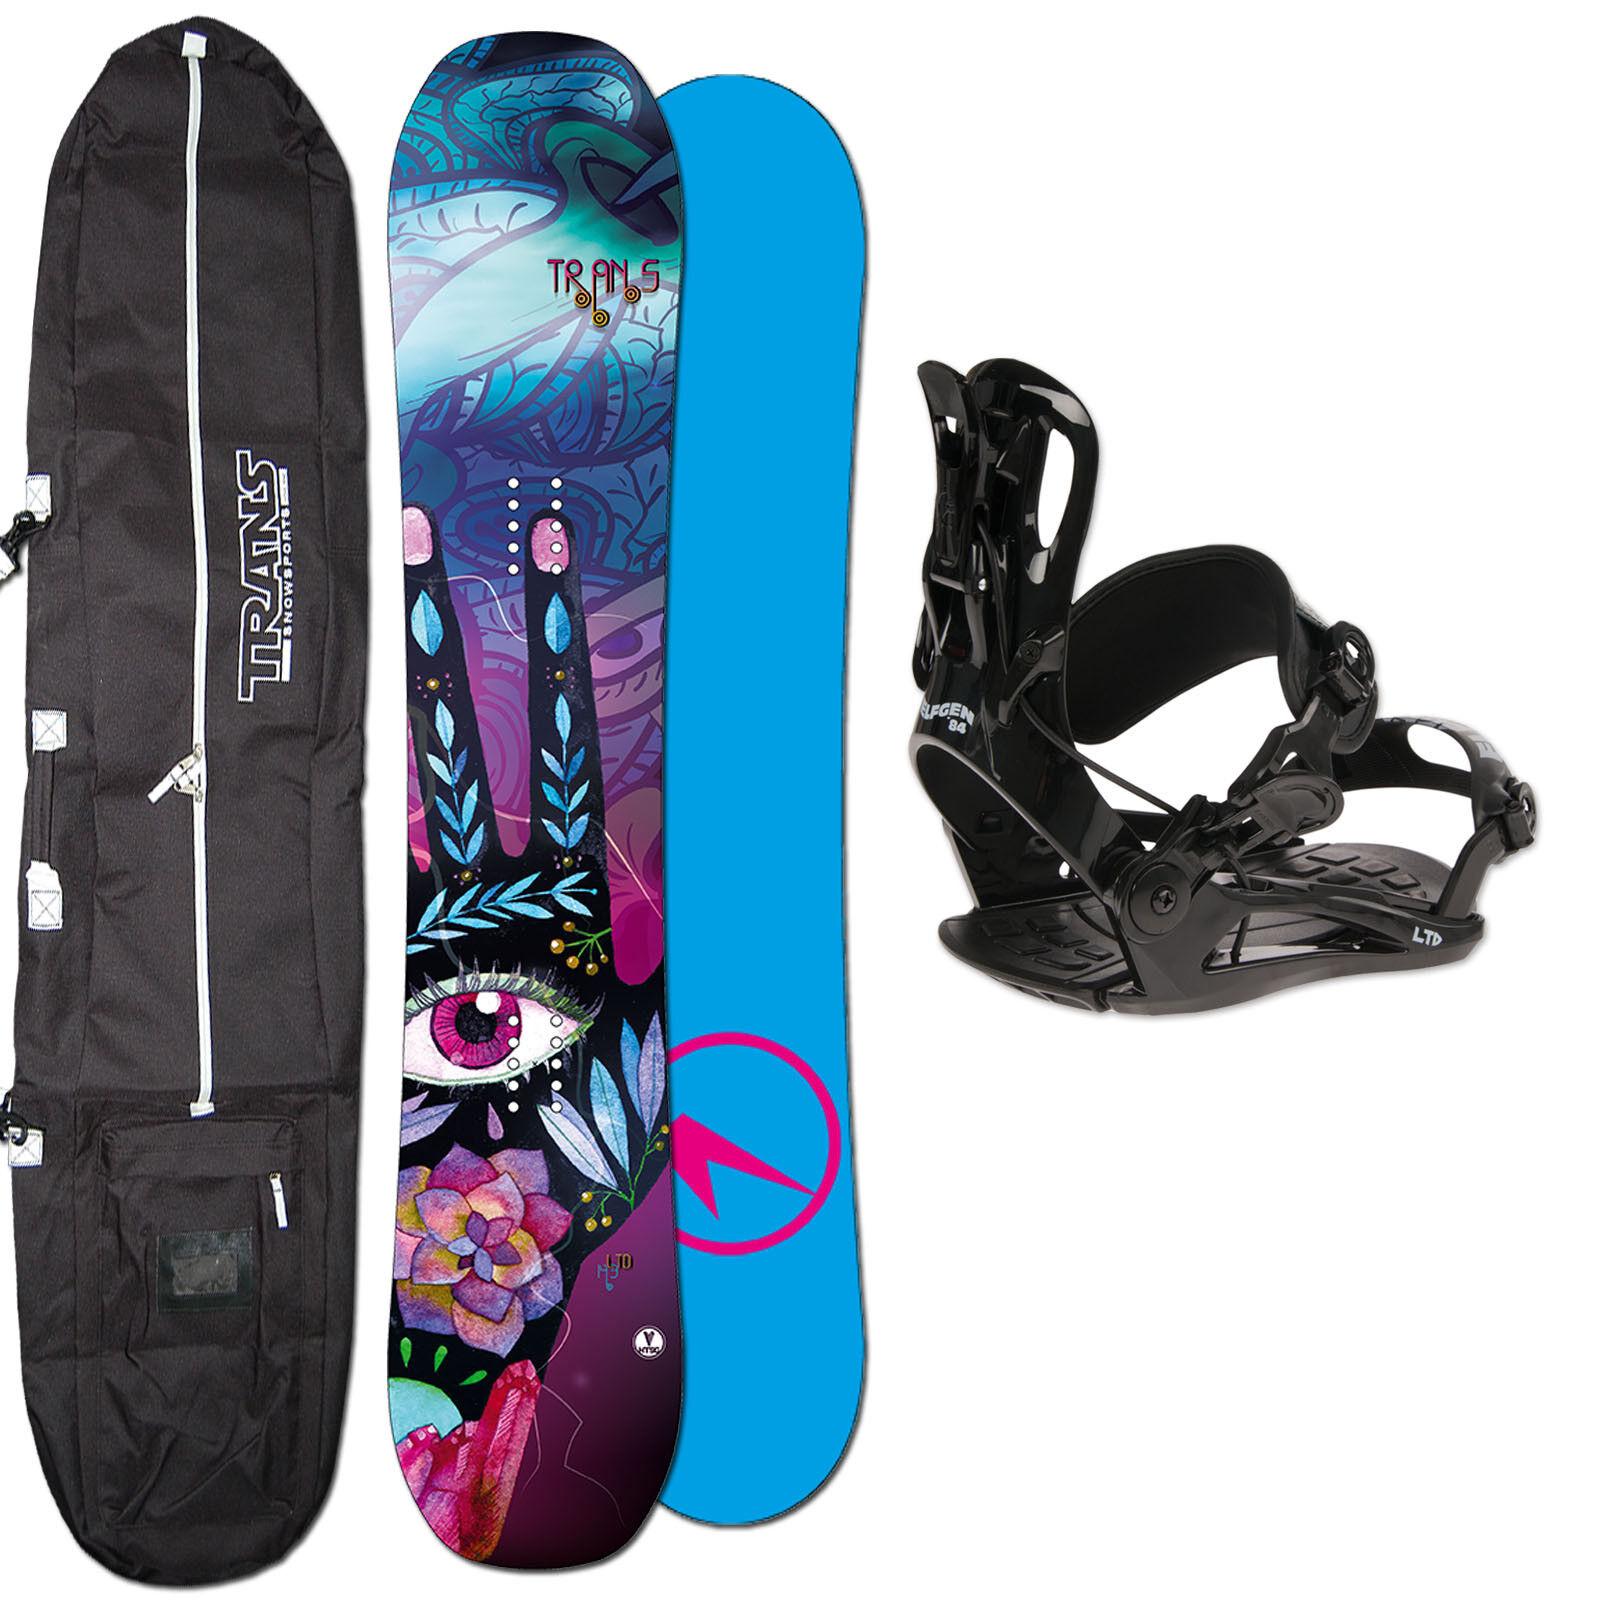 Mujer Roquero Snowboard Trans Ltd 147 cm + Fastec Fijación TALLA M + Bolsa